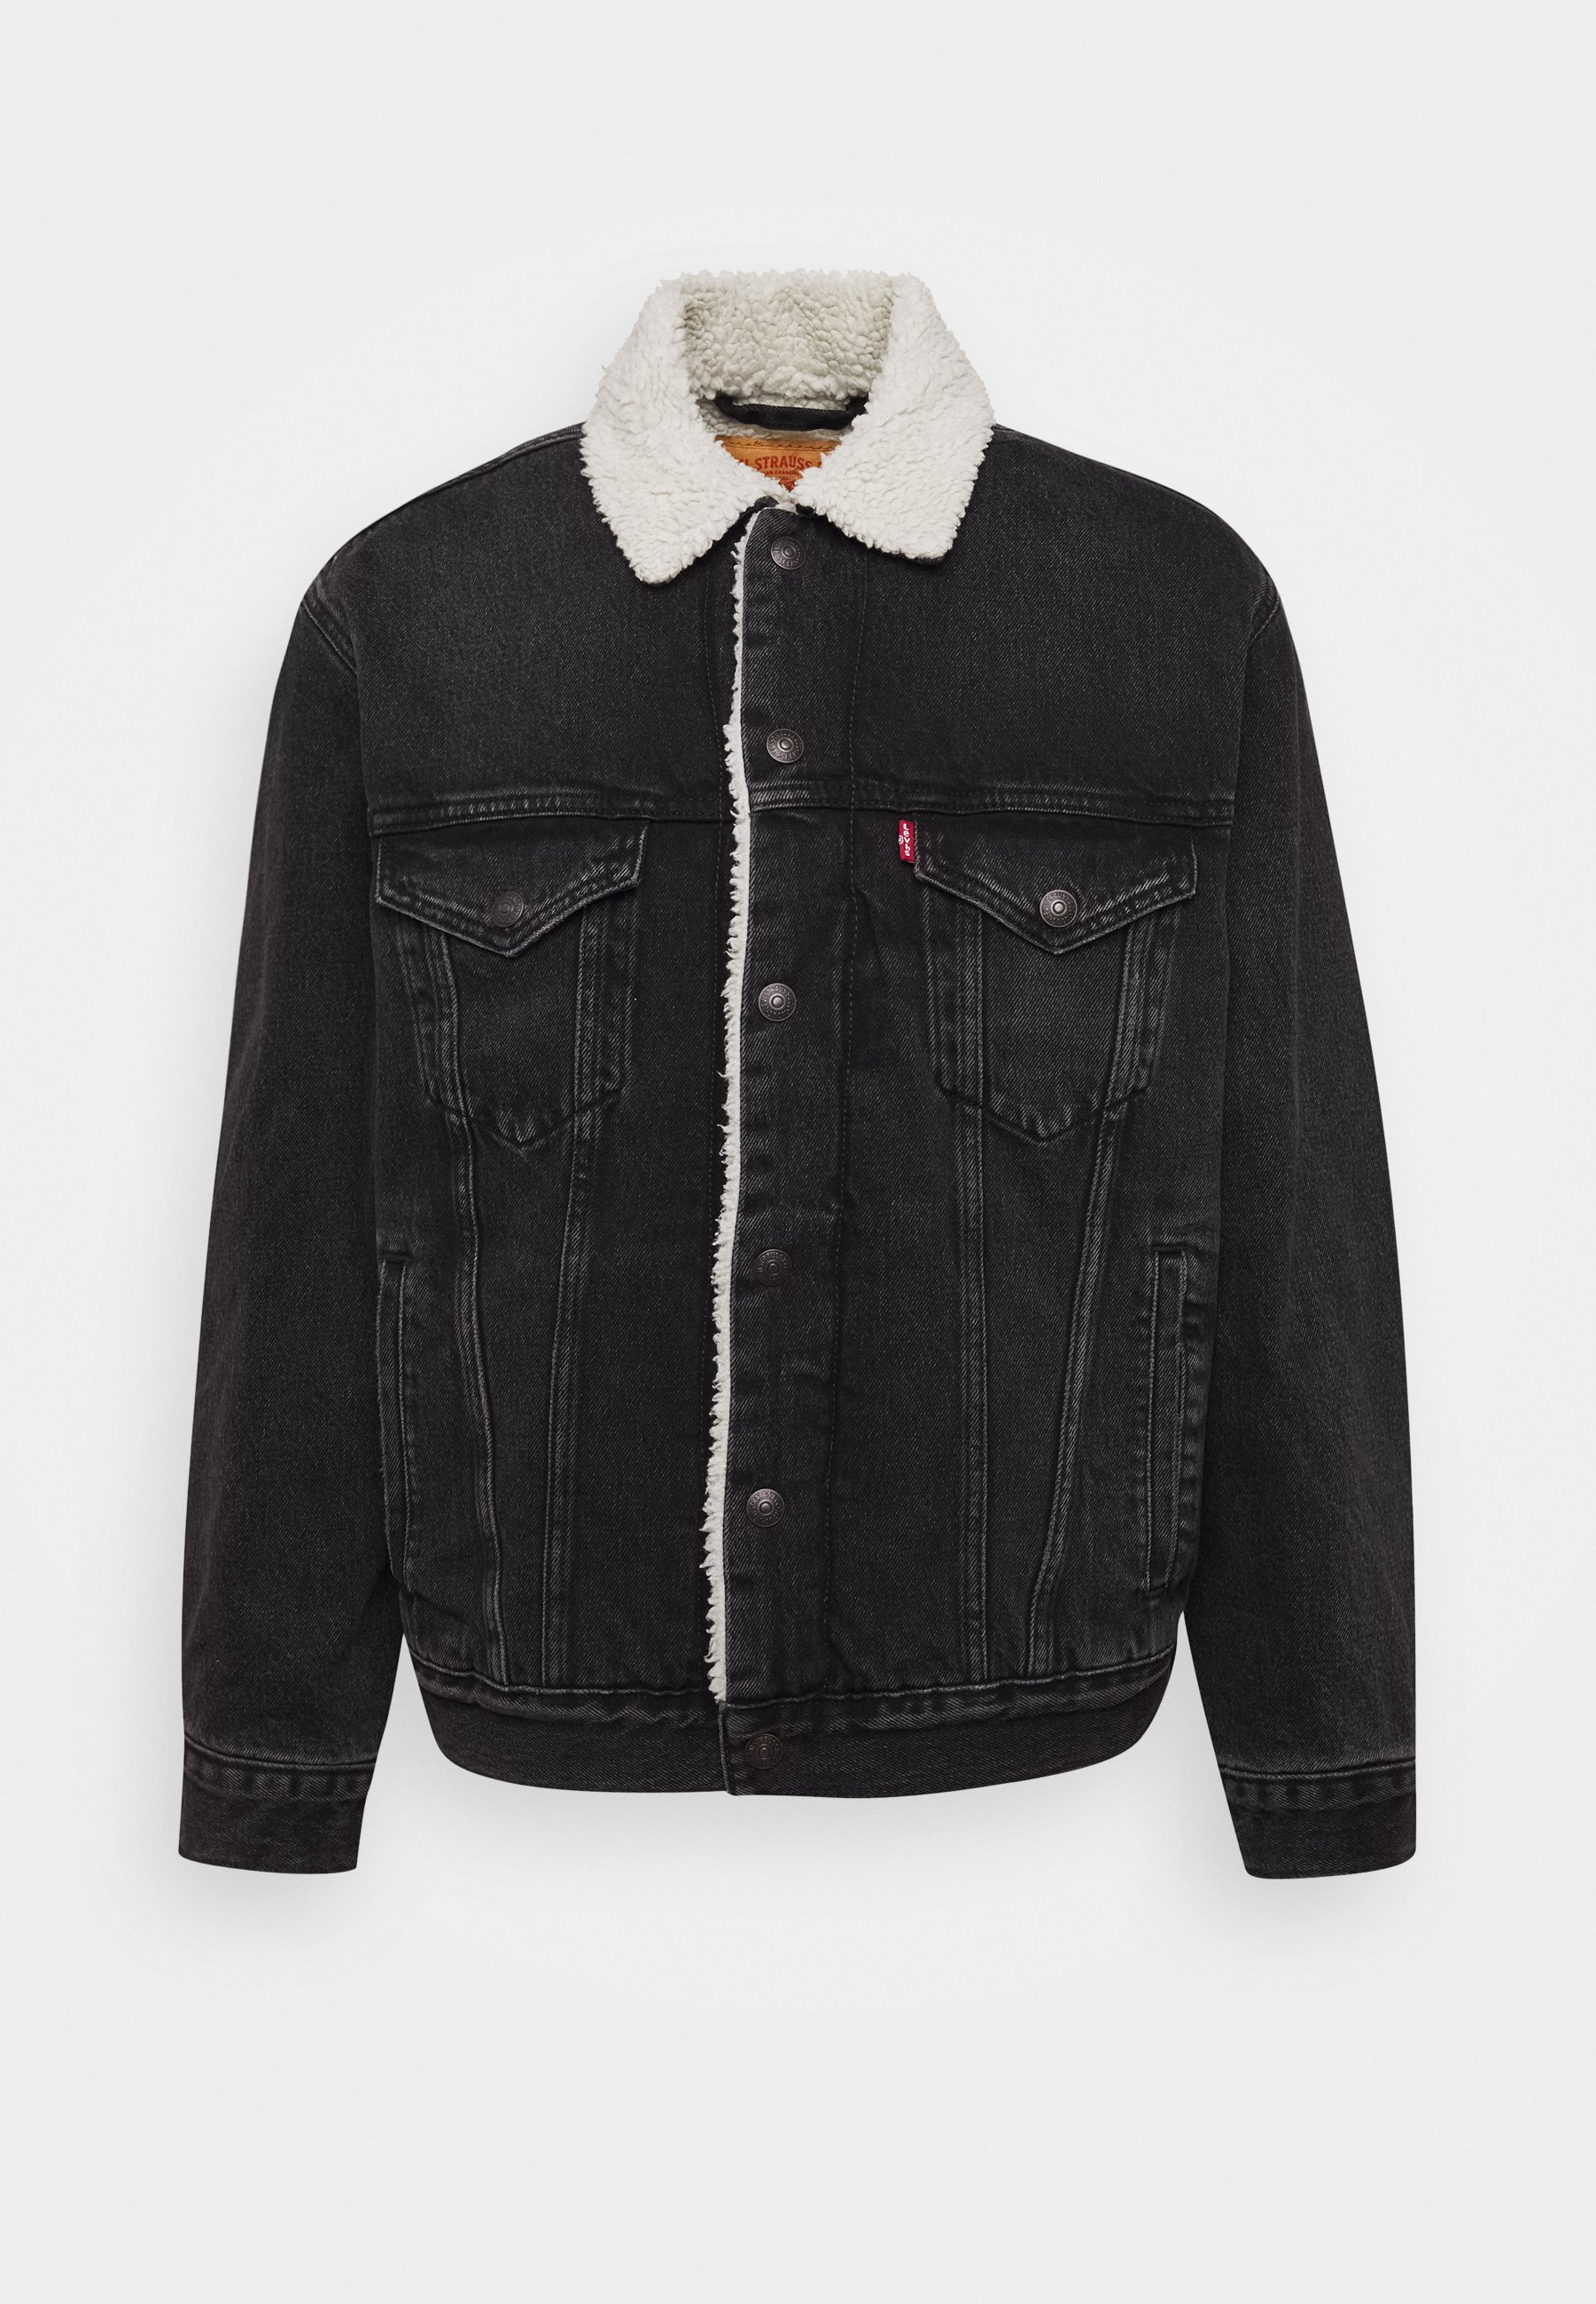 Mango Jeansjackor | Herr | Köp jeansjacka online på Zalando.se